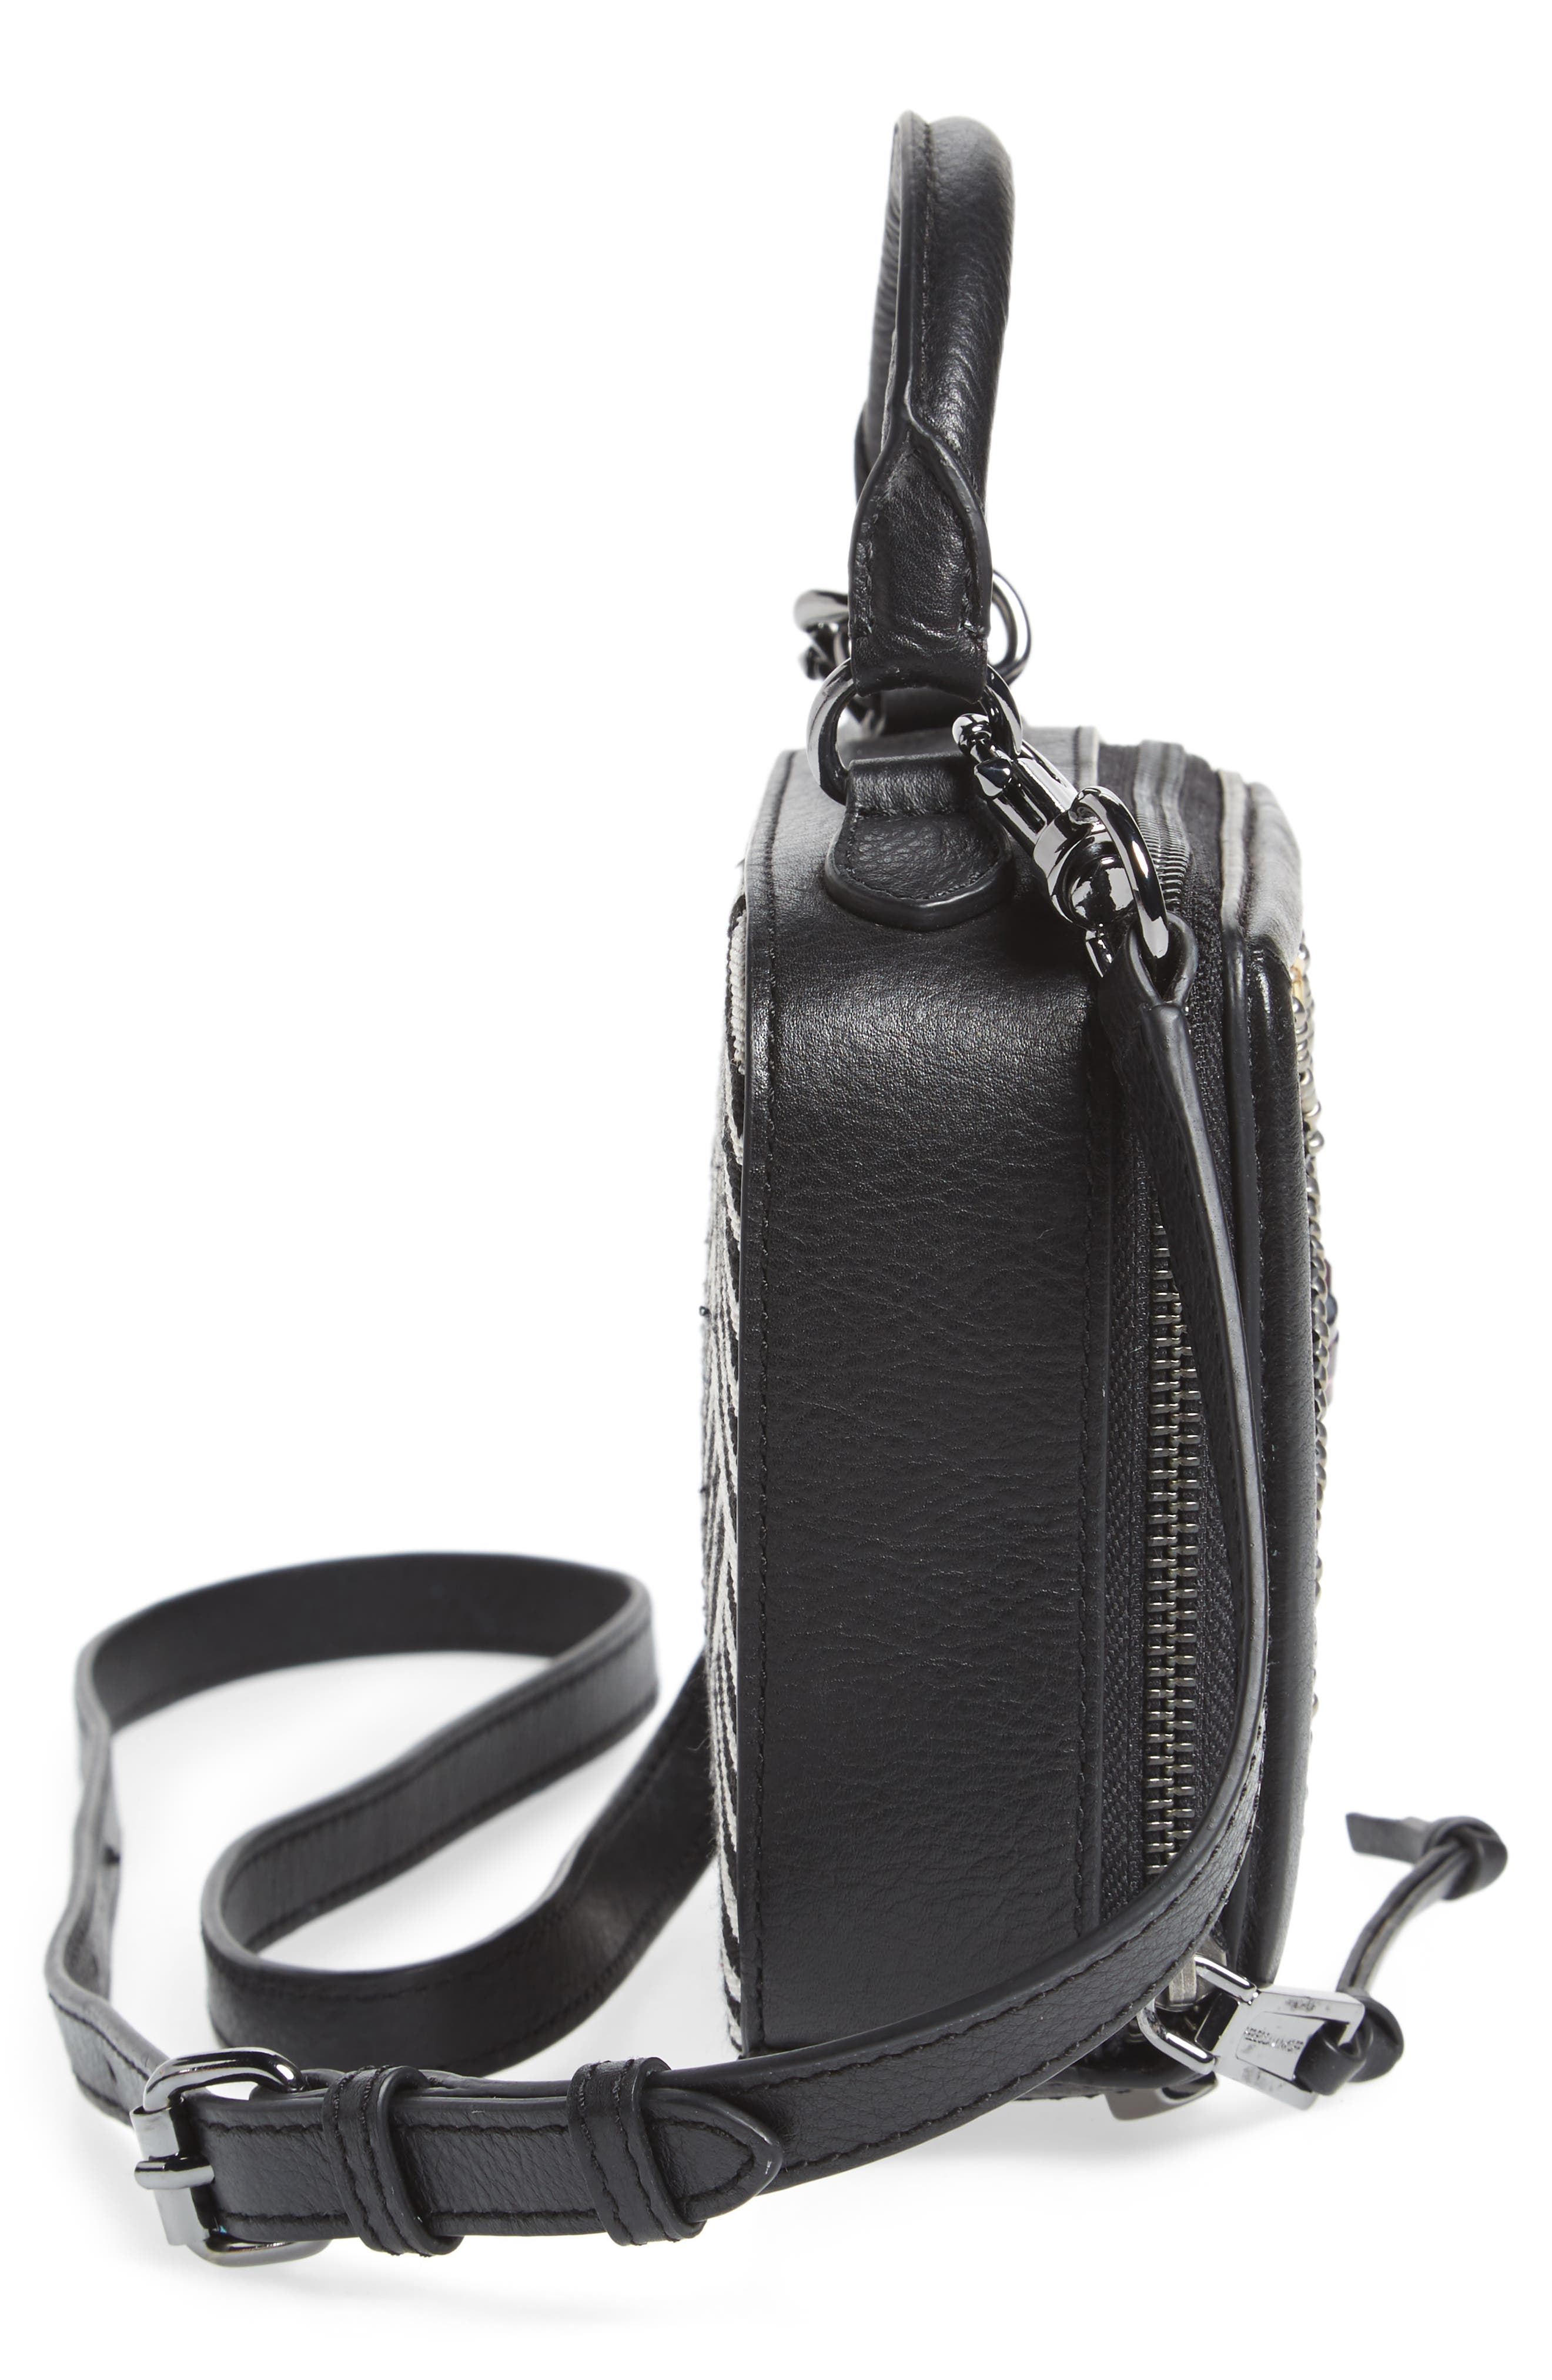 Wonder Box Embellished Crossbody Bag,                             Alternate thumbnail 5, color,                             Black Metallic Multi